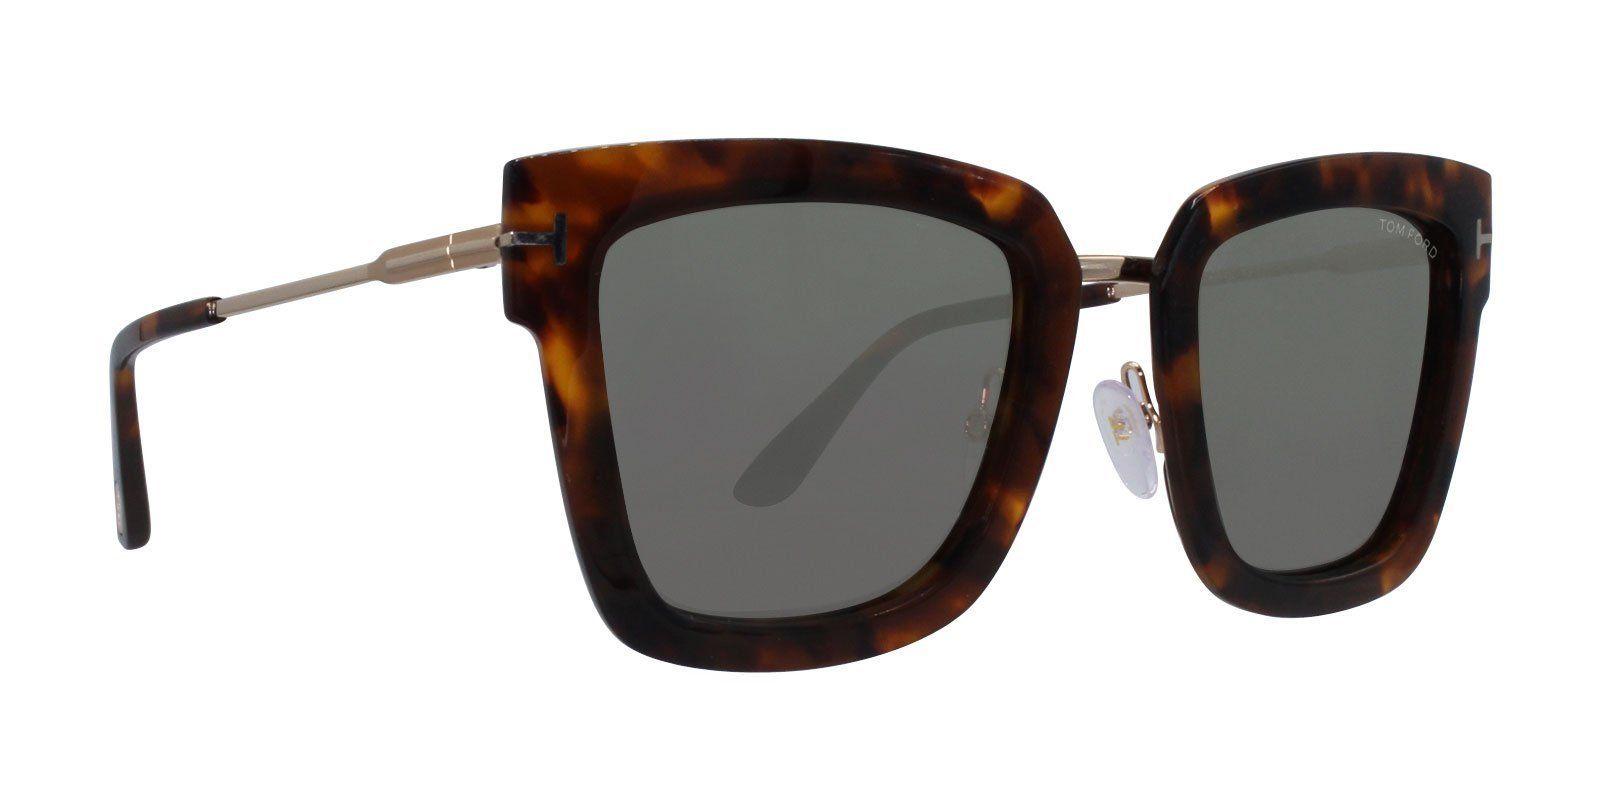 7965f9f14a50 Tom Ford - Lara-02 Tortoise Gold - Green-sunglasses-Designer Eyes ...